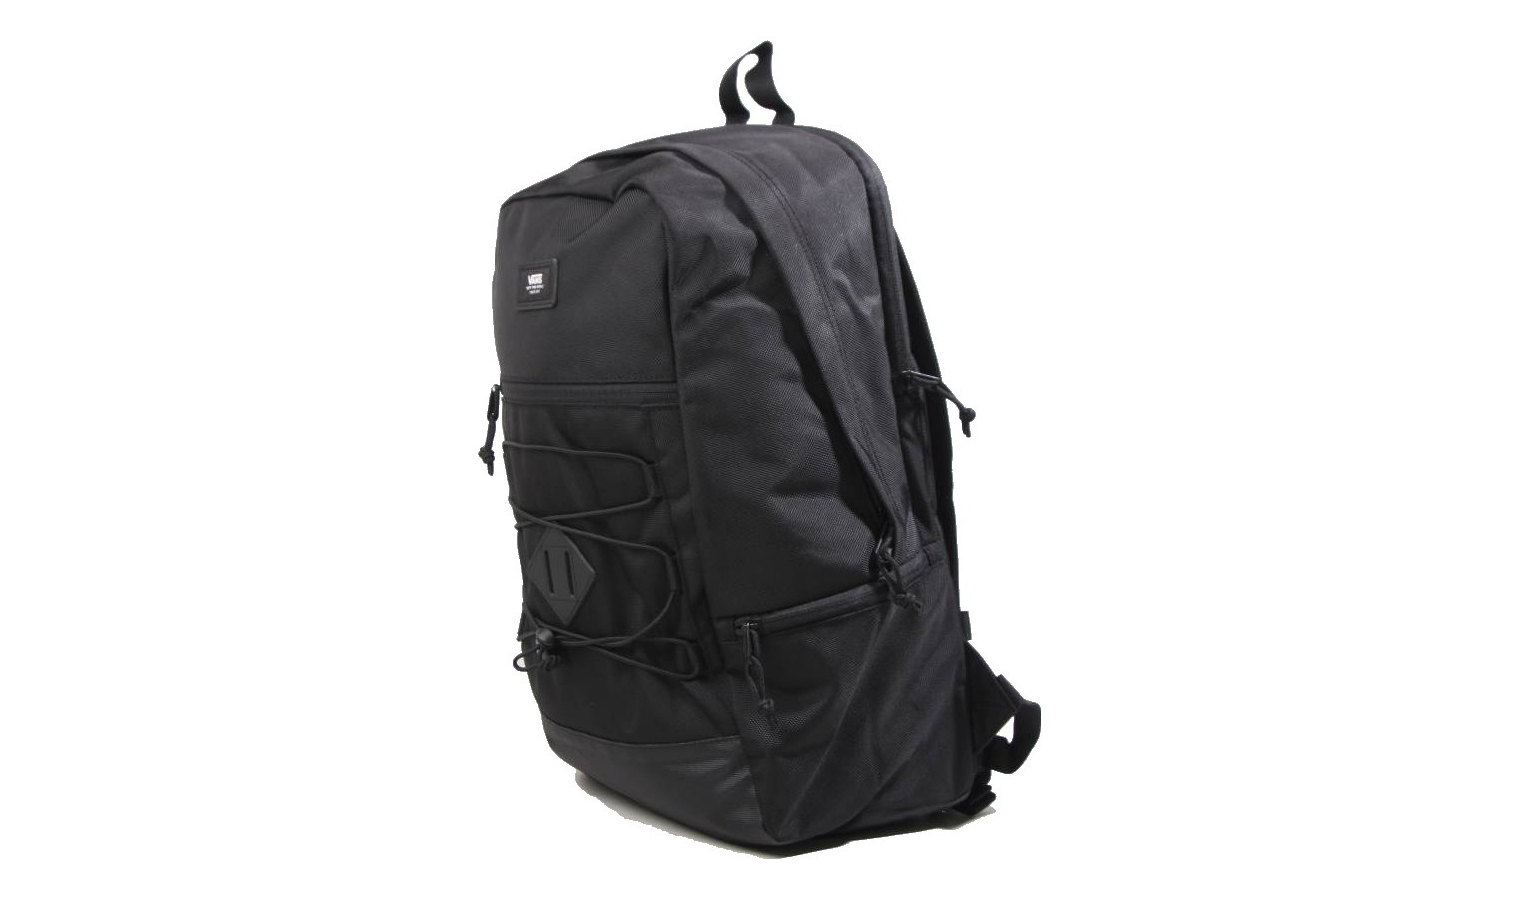 327f0e2104e ... Pánský batoh Vans MN SNAG PLUS BACKPACK černý. Sleva